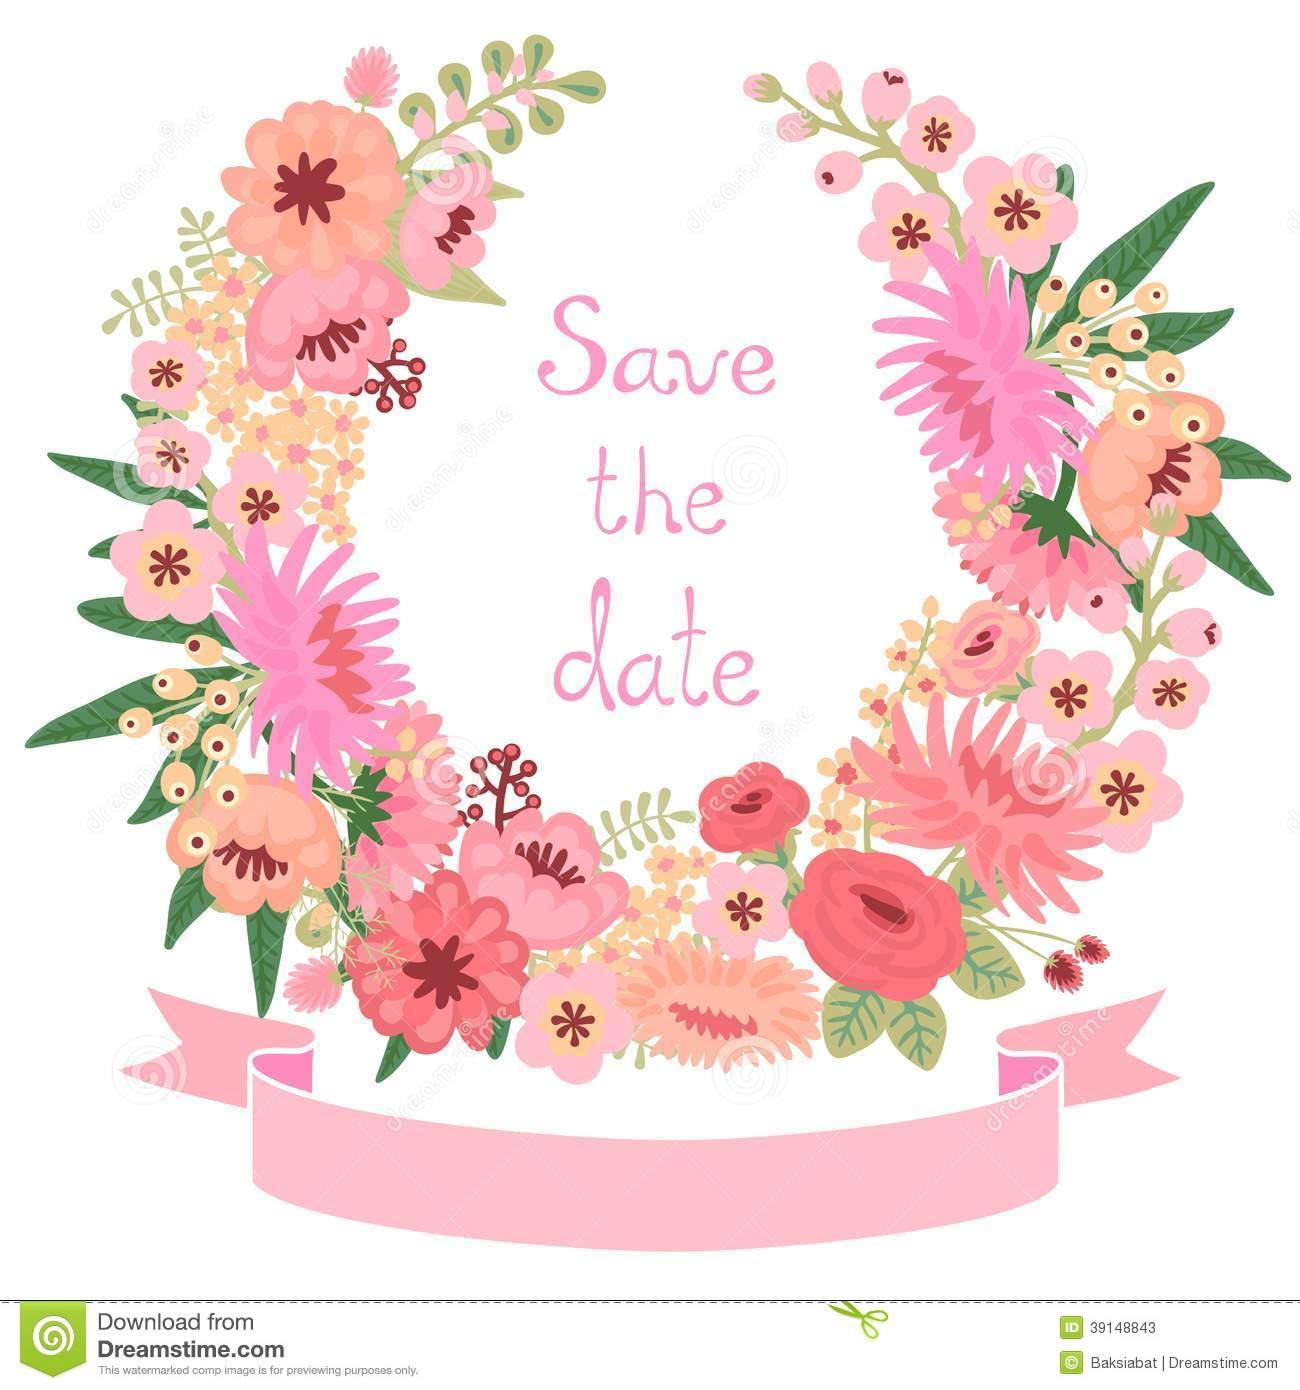 Vintage Flower clipart elegant invitation #2